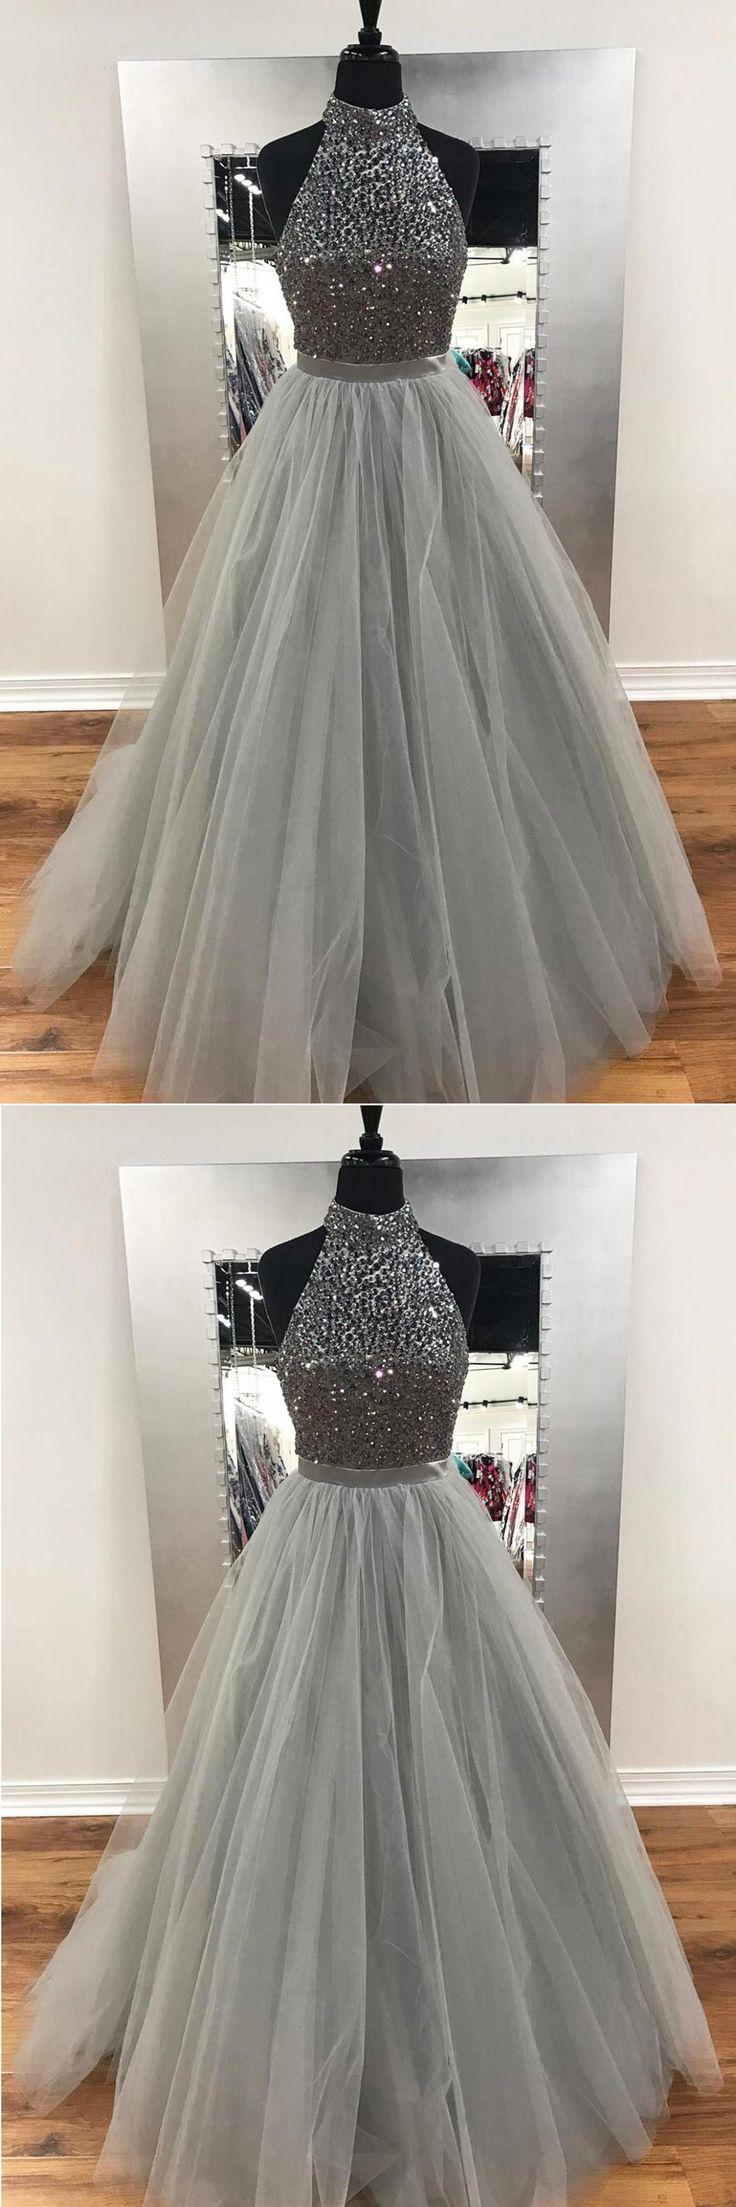 2018 gray tulle long sliver sequins prom dresses, long evening dress #longpromdresses